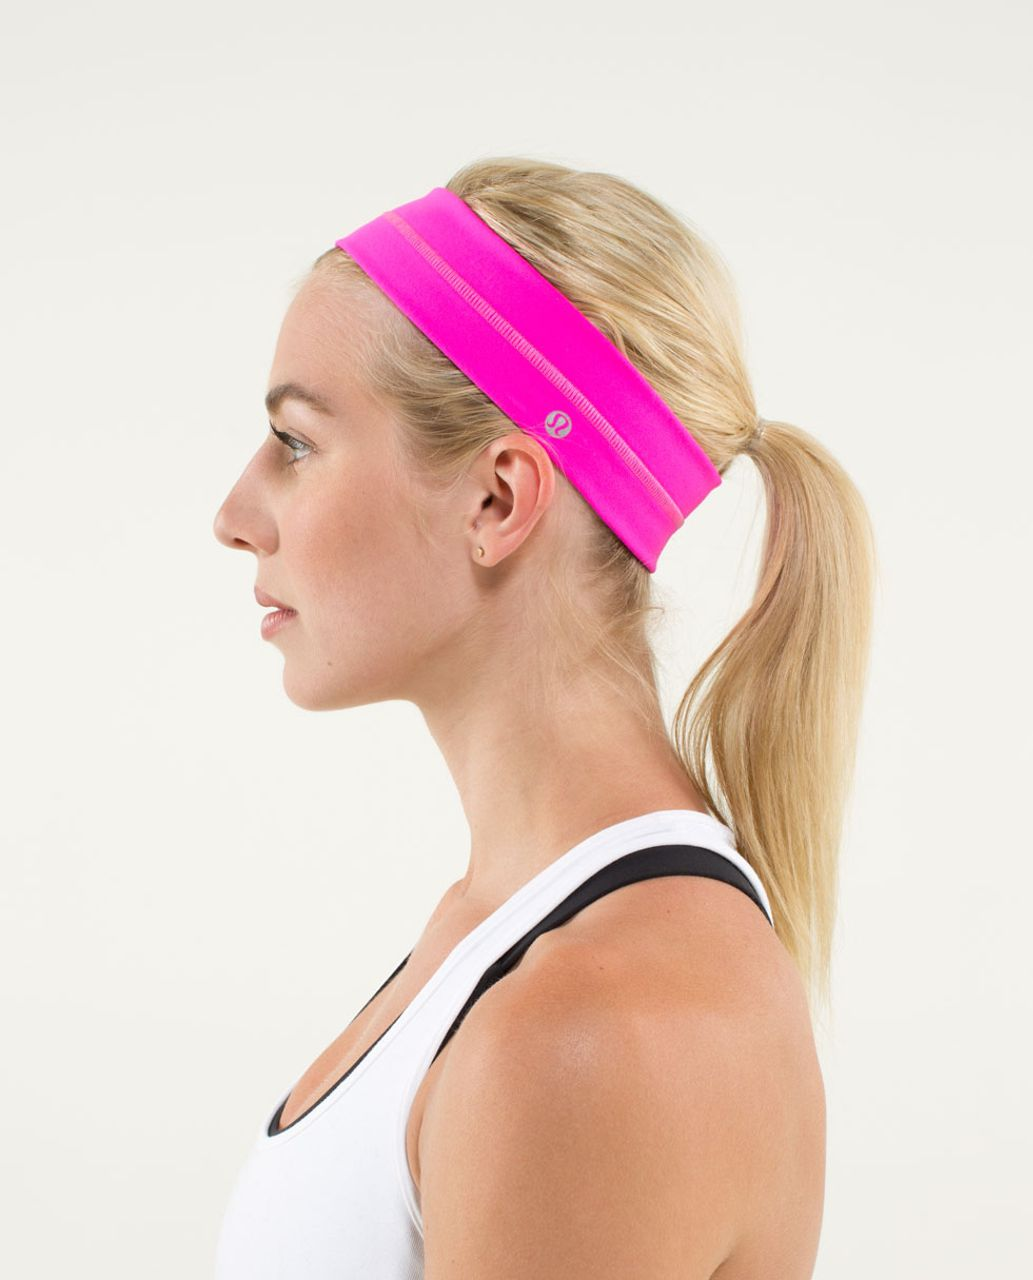 Lululemon Fly Away Tamer Headband - Raspberry Glo Light